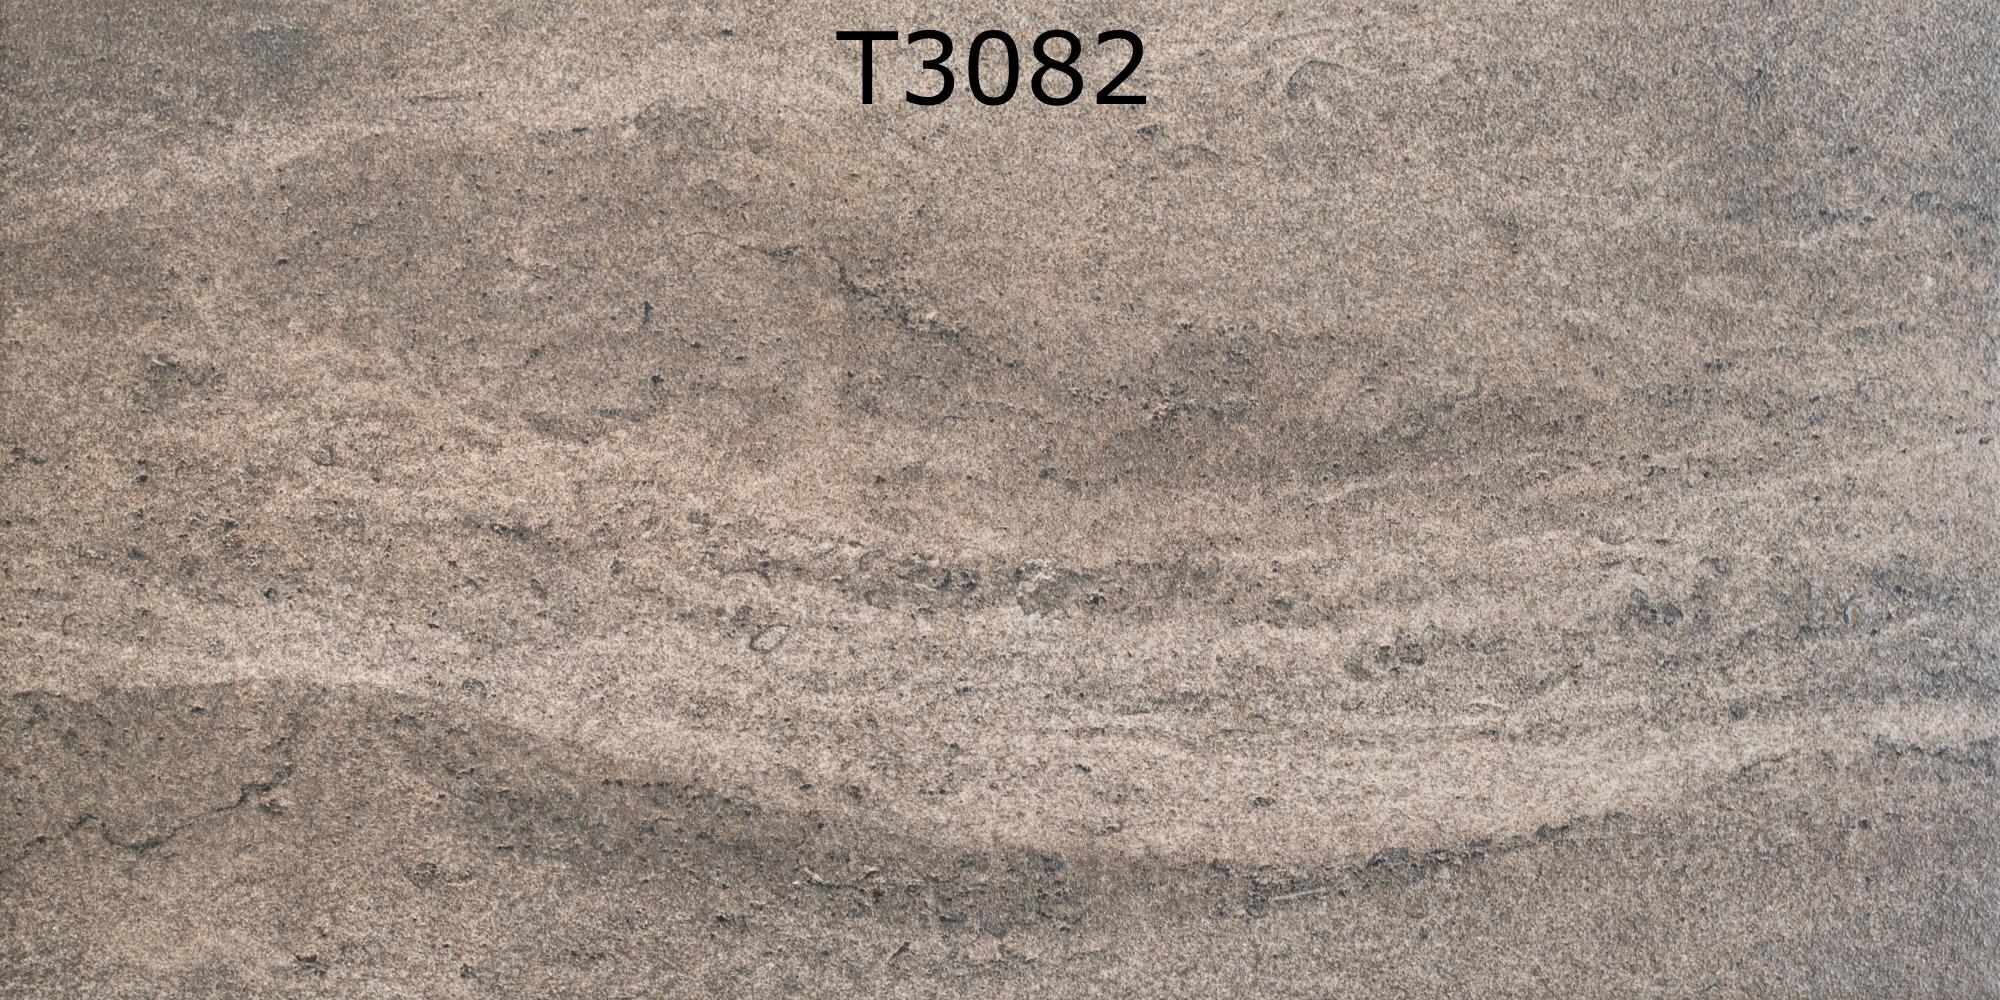 T3082